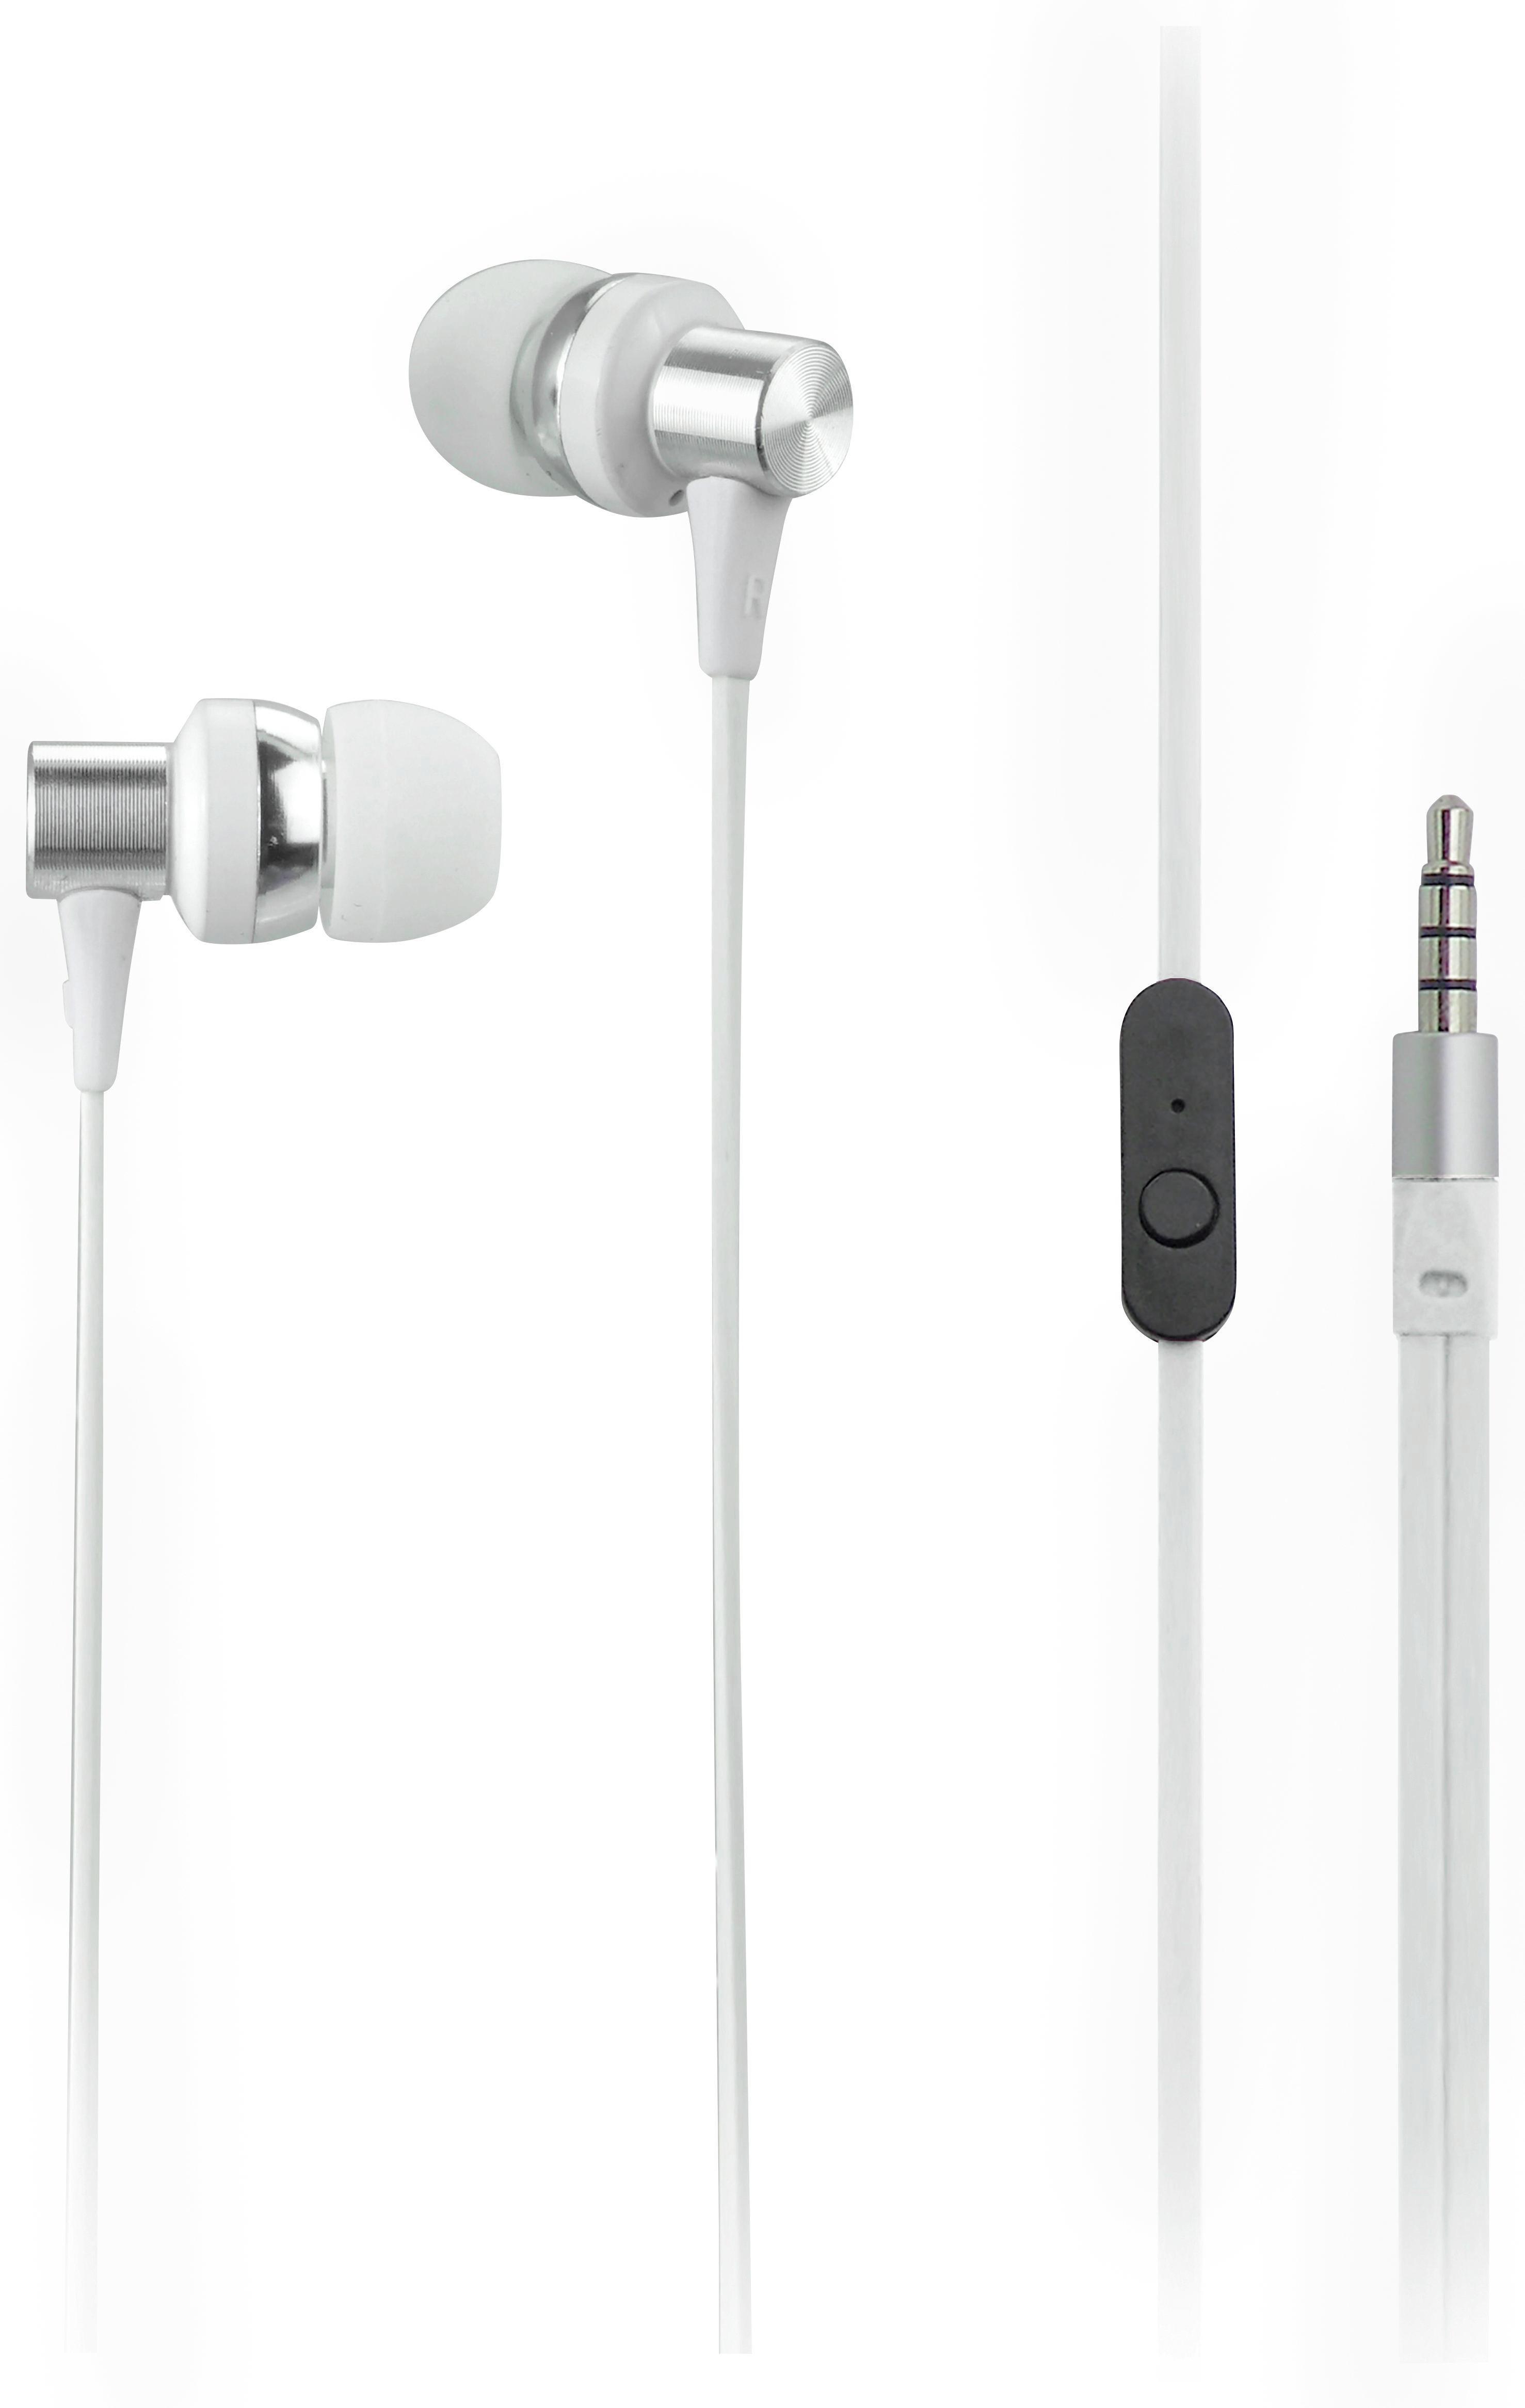 Ohrhörer Cara in Weiß - Weiß, Metall - MÖMAX modern living